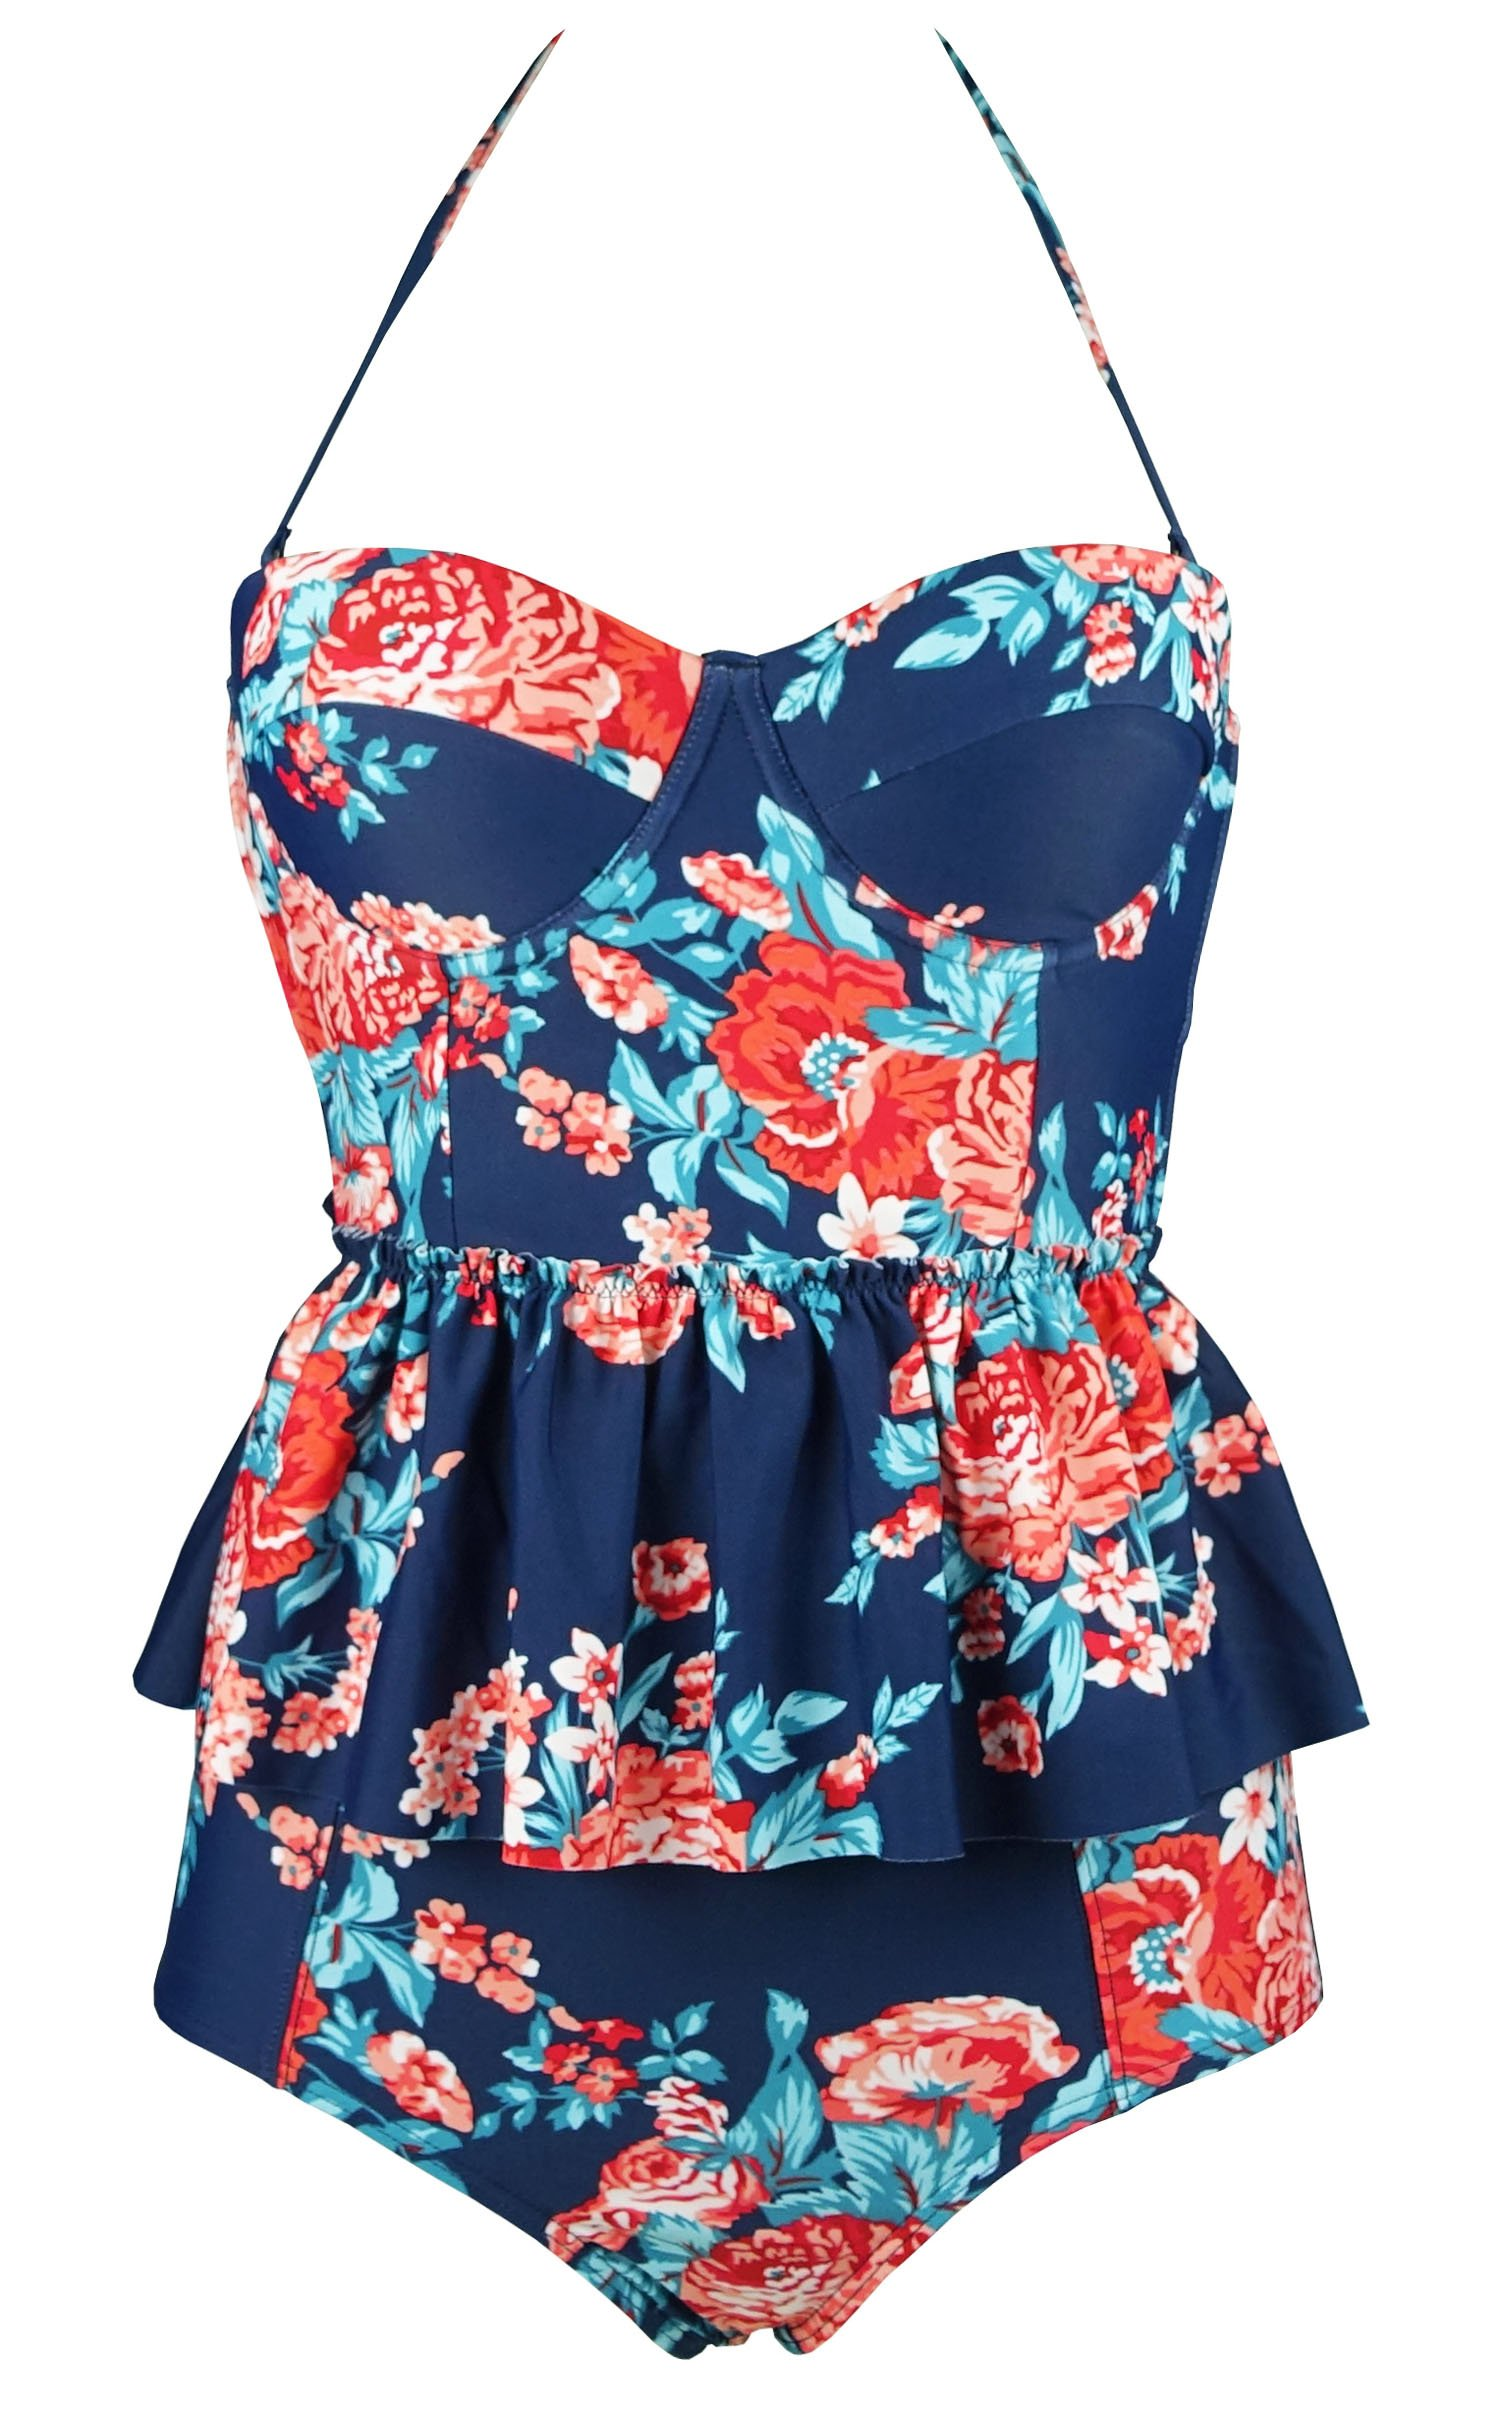 COCOSHIP Red Pink & Navy Blue Antigua Floral Peplum Women's Retro Push up High Waist Bikini Set Chic Swimsuit Swimwear S(FBA)